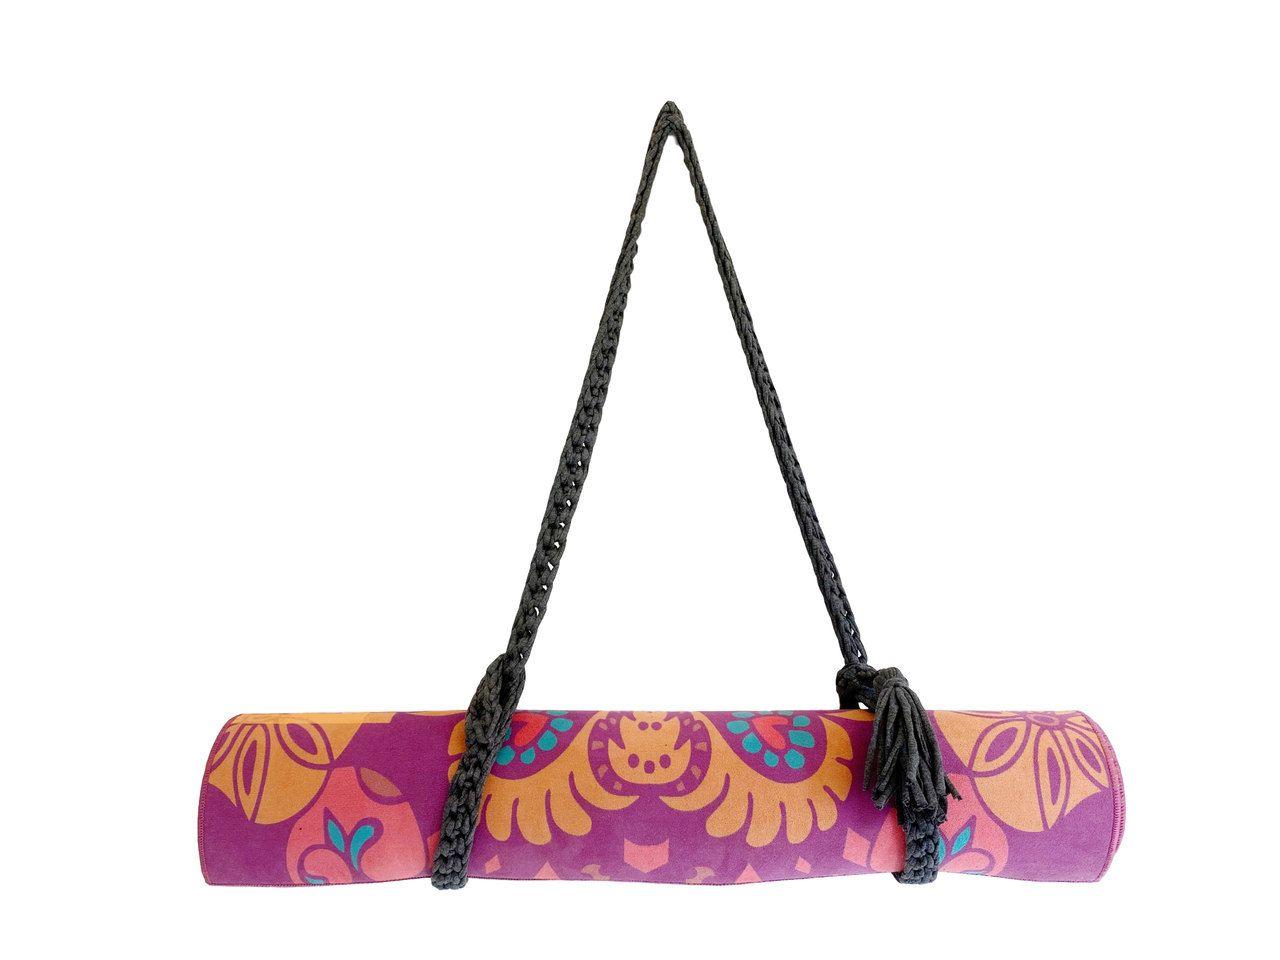 Porta Tapete - Crochê com alça padrão (Produto artesanal)